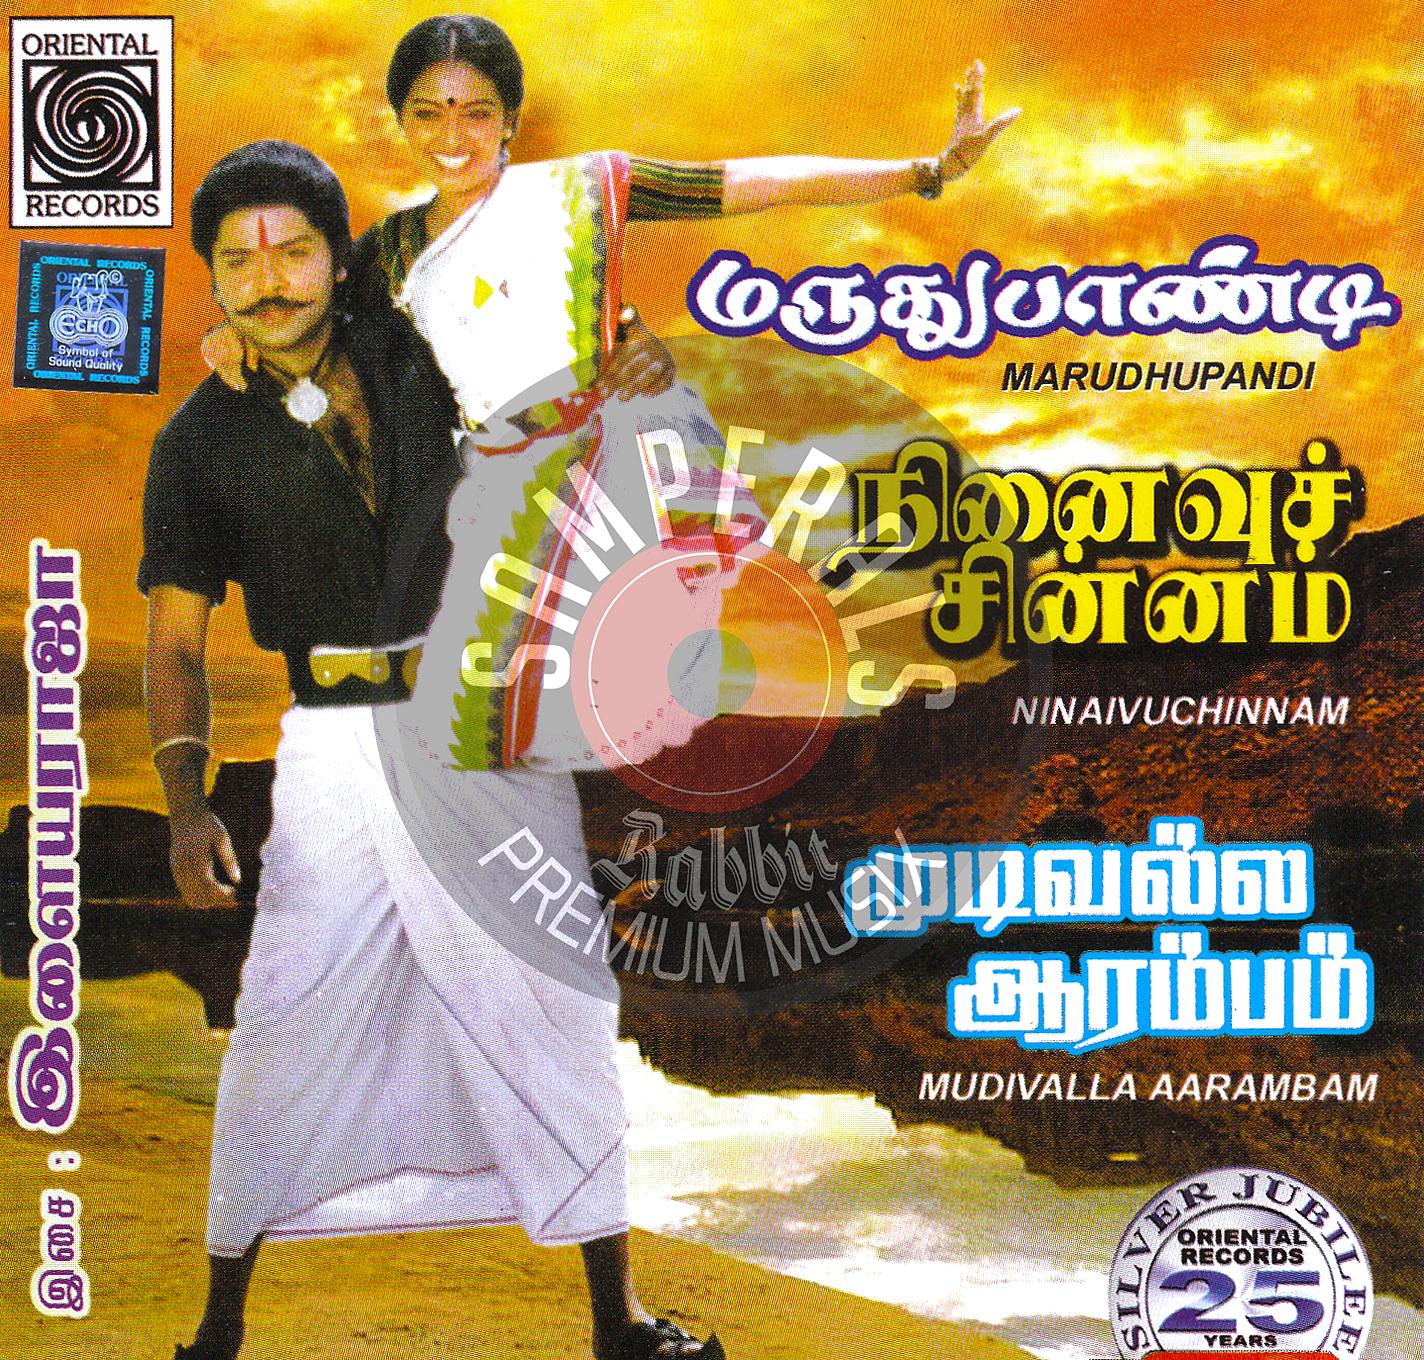 Ninaivu Chinnam 1989 Acdrip Wav Audio Songs Songs Comic Book Cover